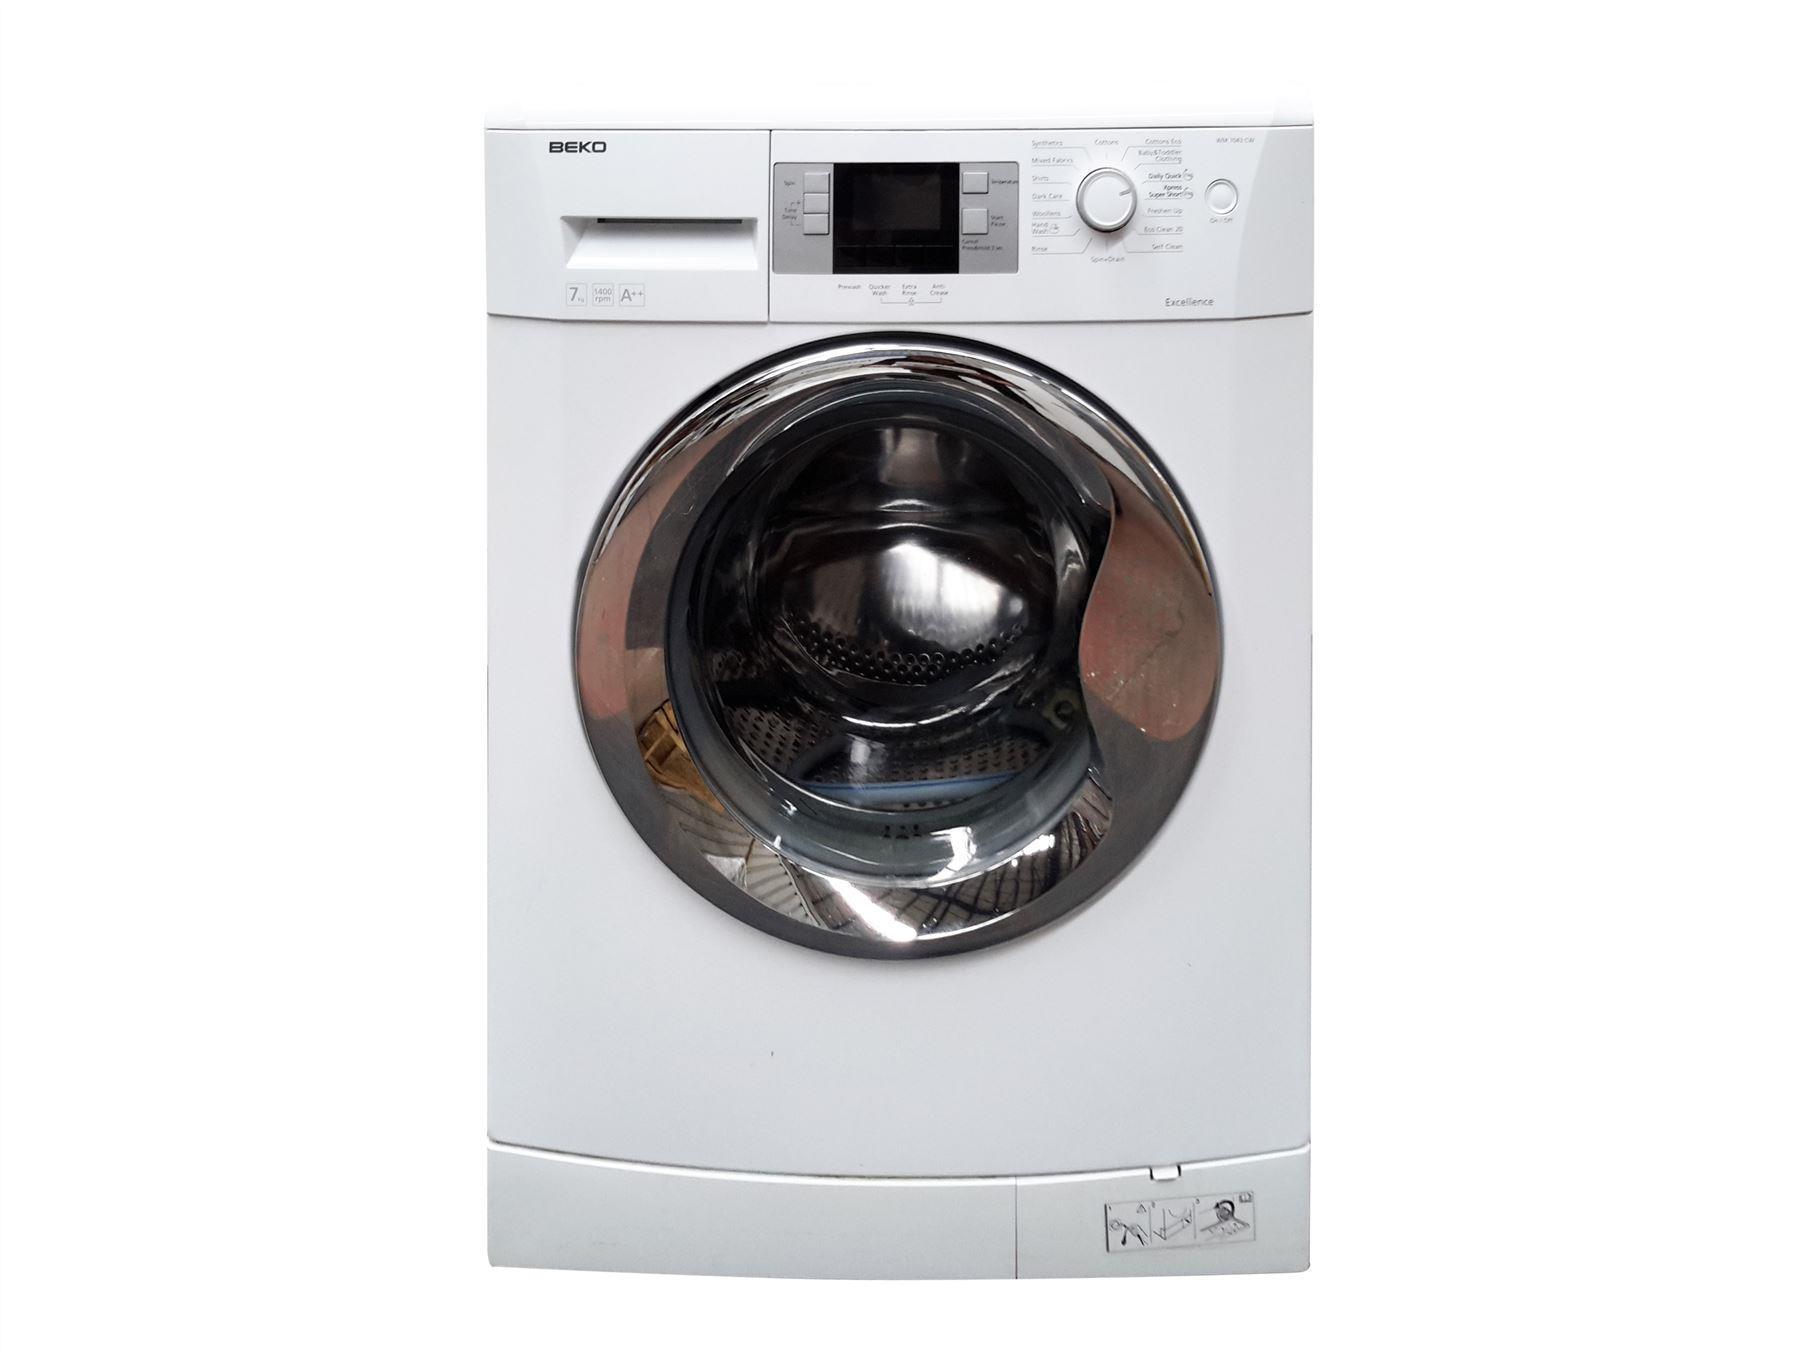 beko wm7043cw 7kg 1400rpm washing machine white online. Black Bedroom Furniture Sets. Home Design Ideas